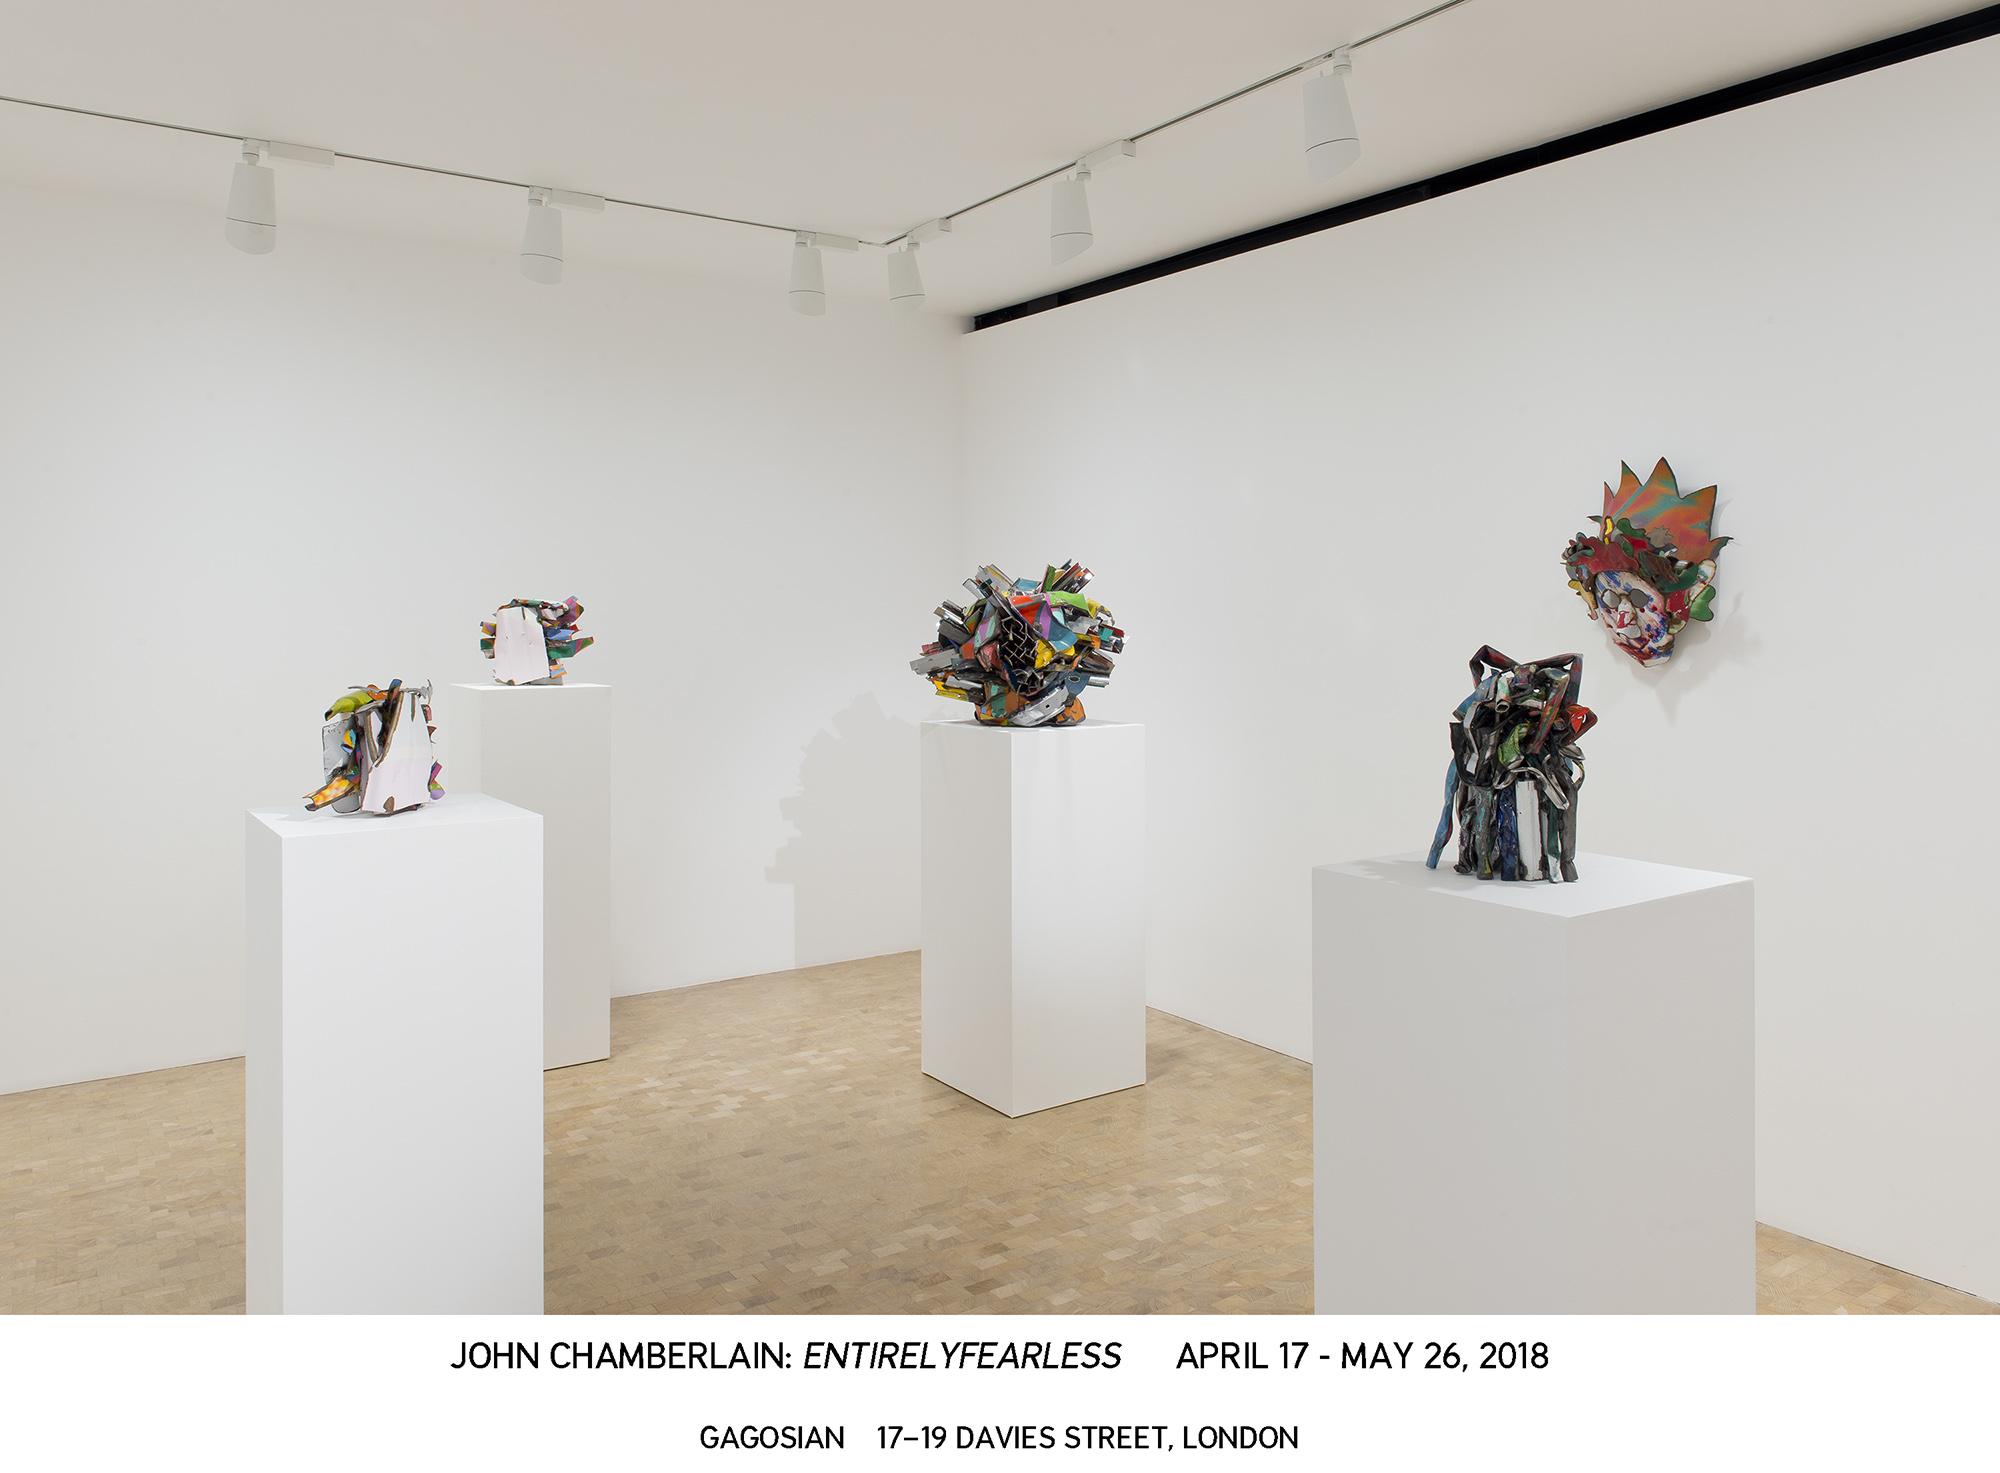 CHAMBERLAIN 2018 ENTIRELYFEARLESS PV room installation view 1.jpg